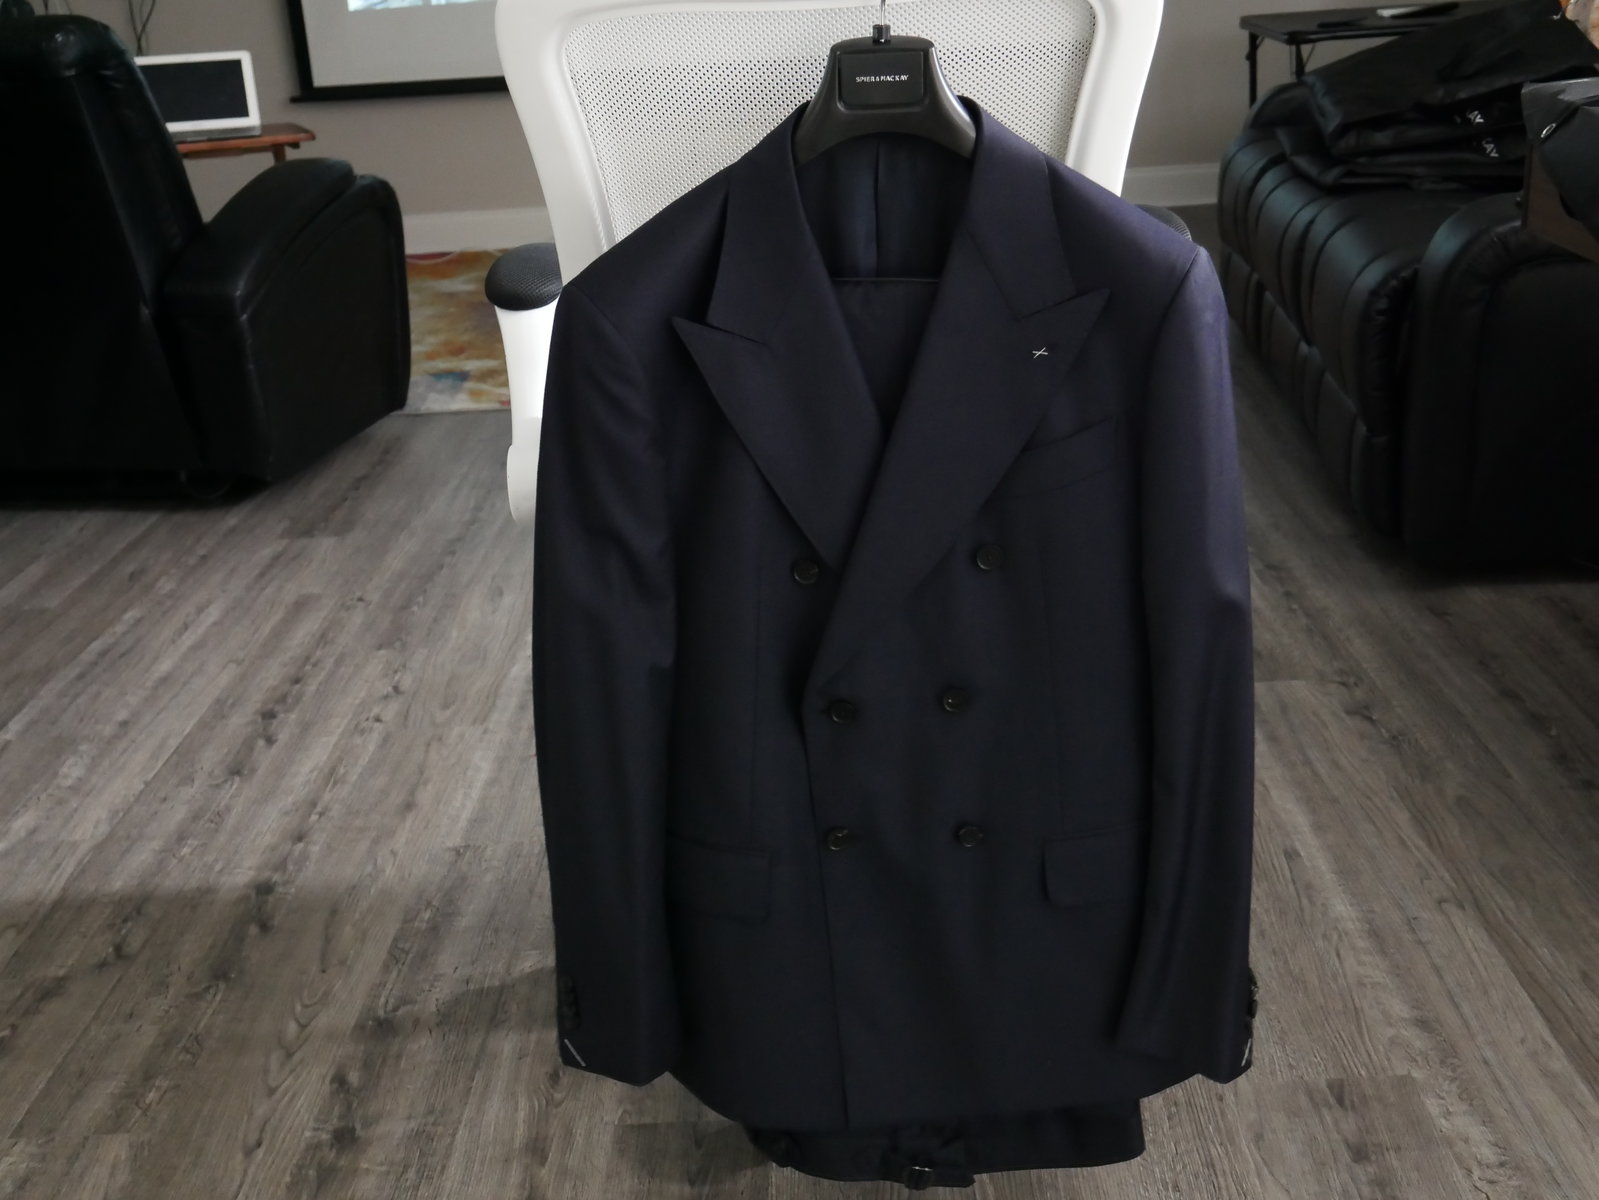 Navy Guabello DB Suit No Light.JPG